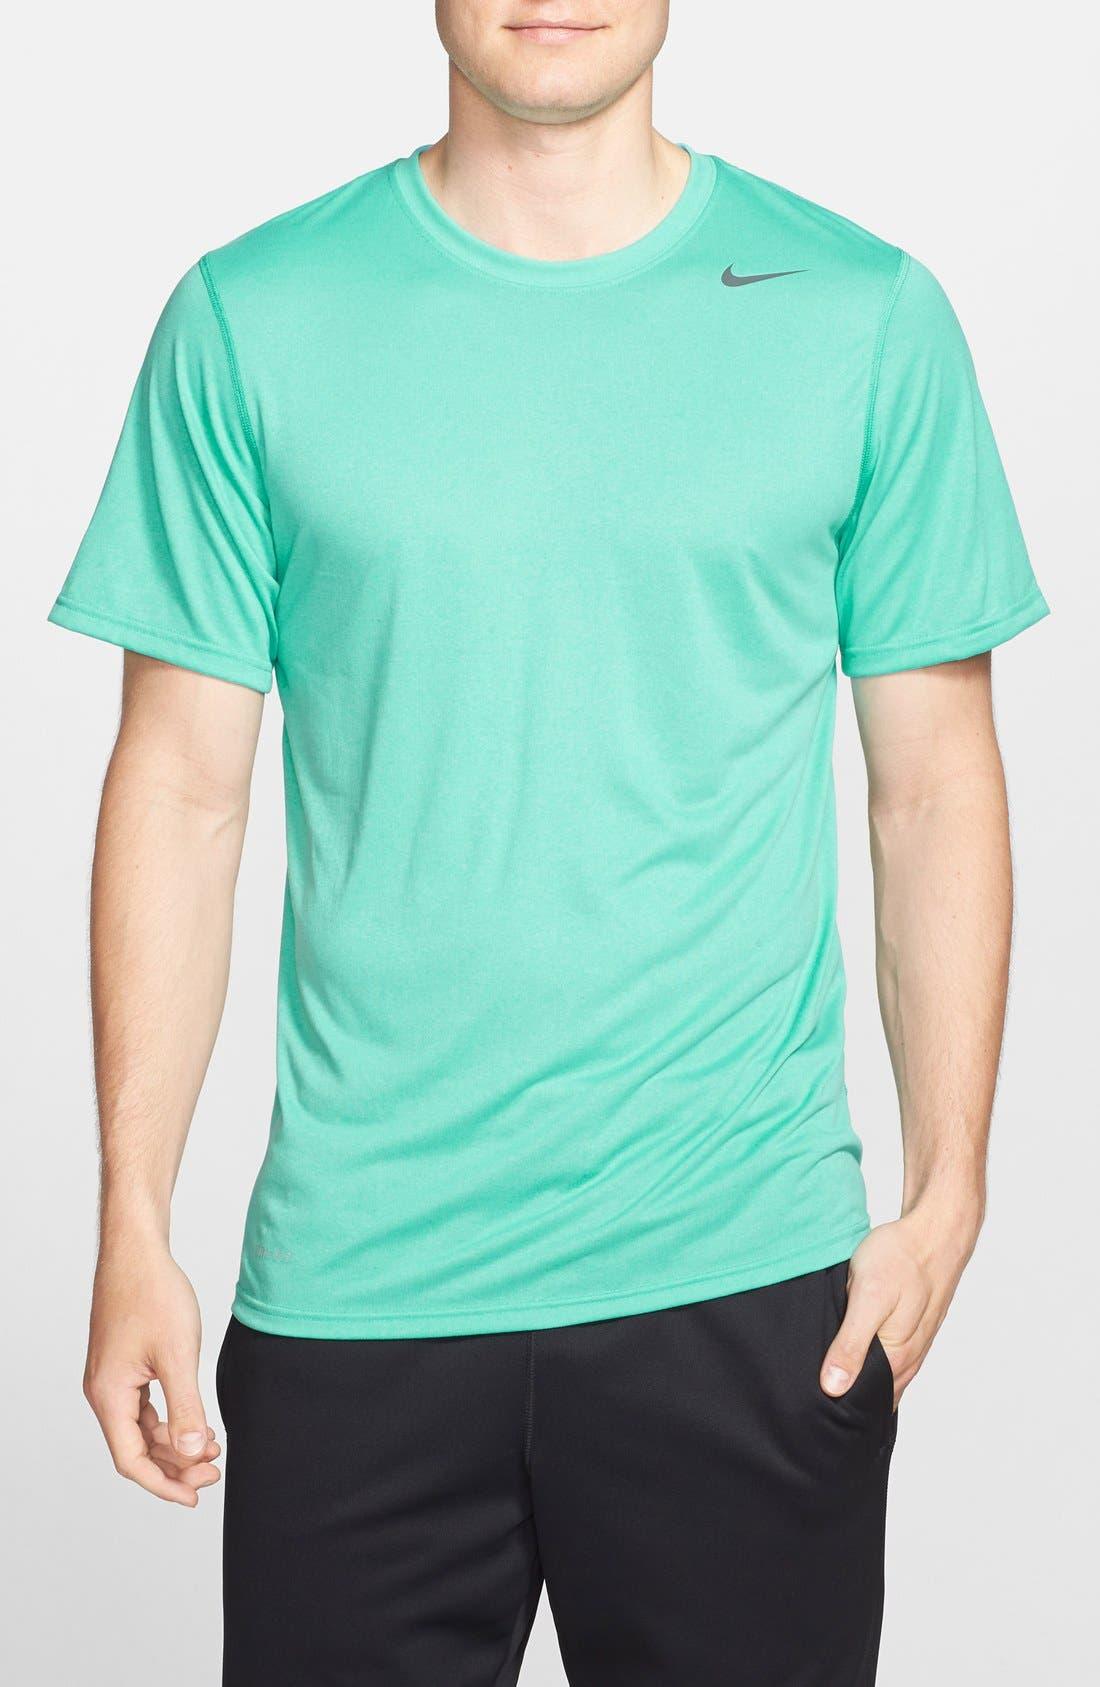 Main Image - Nike 'Legends' Dri-FIT T-Shirt